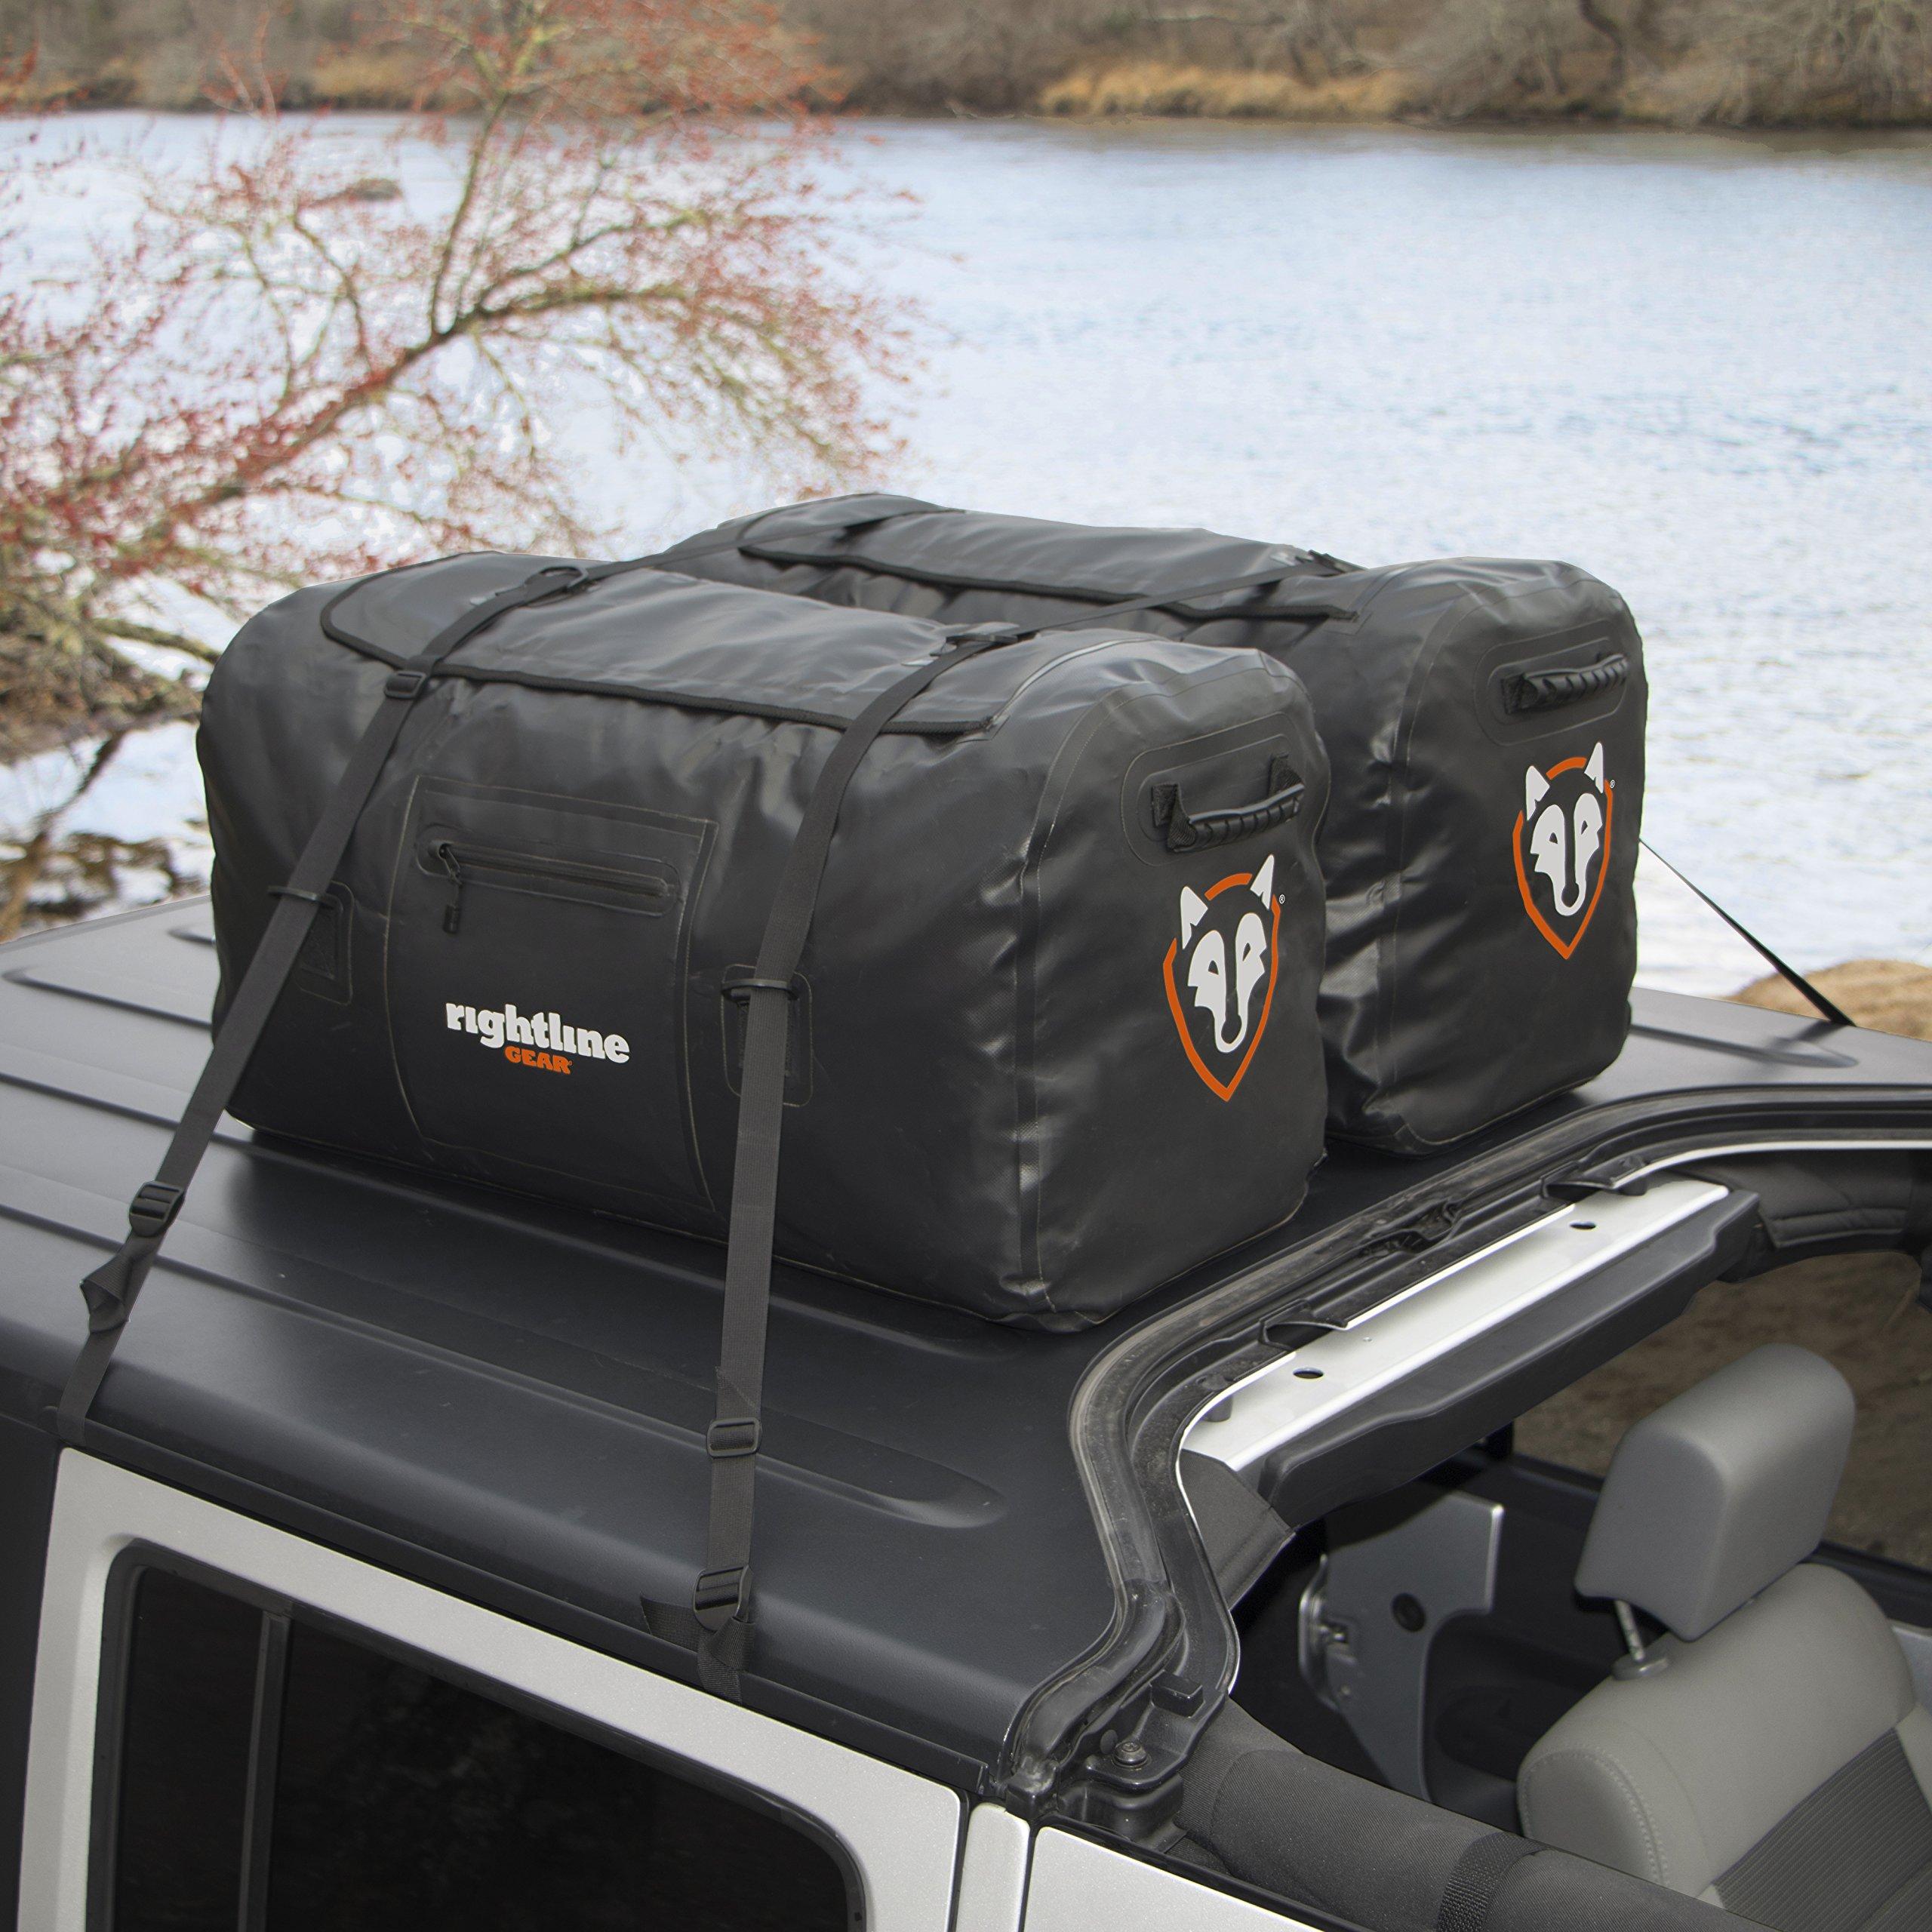 Rightline Gear 100J87-B 4x4 Duffle Bag (120L) by Rightline Gear (Image #6)